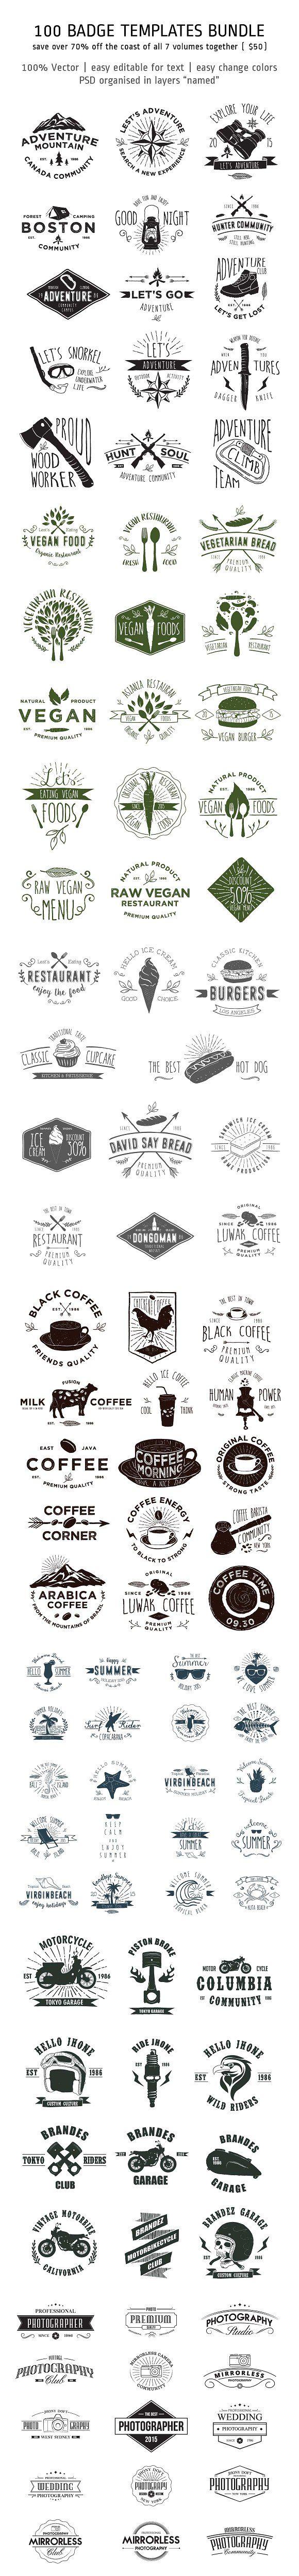 100 Badge Templates Bundle by alit design on @creativemarket